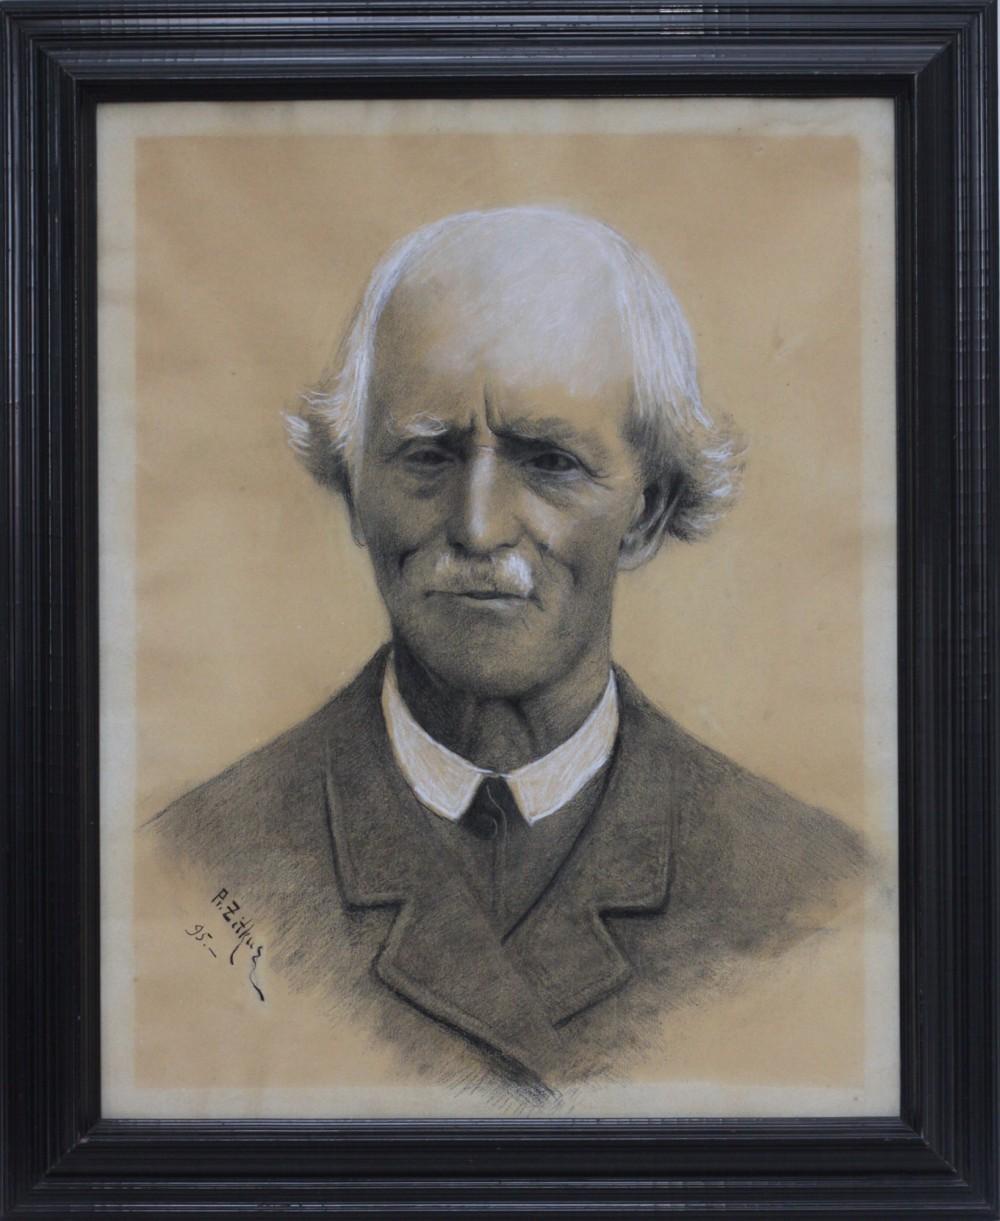 J. Tumo-Vaižganto tėvo Anupro Tumo portretas. Dail. P. Žitkus. 1895 m.